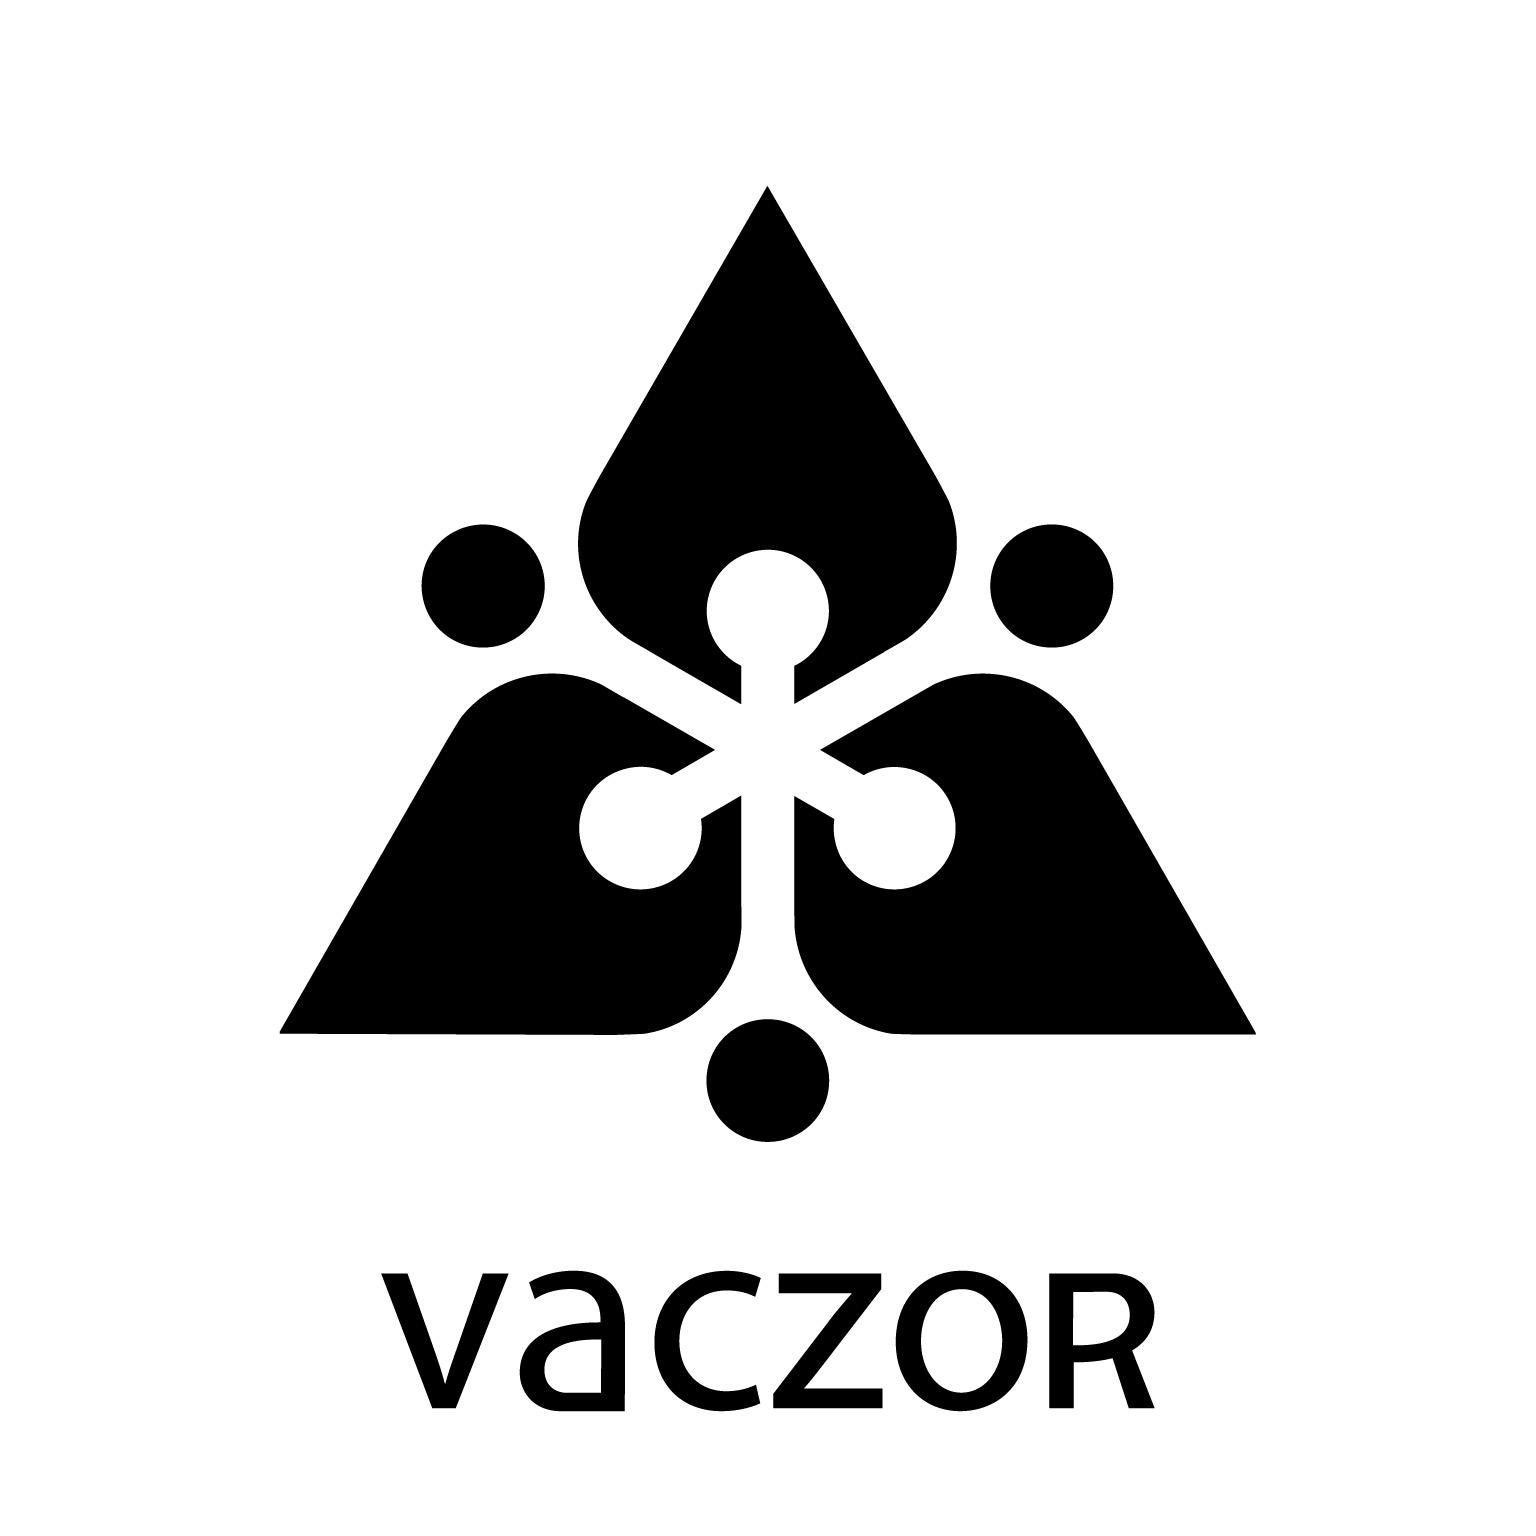 VACZOR